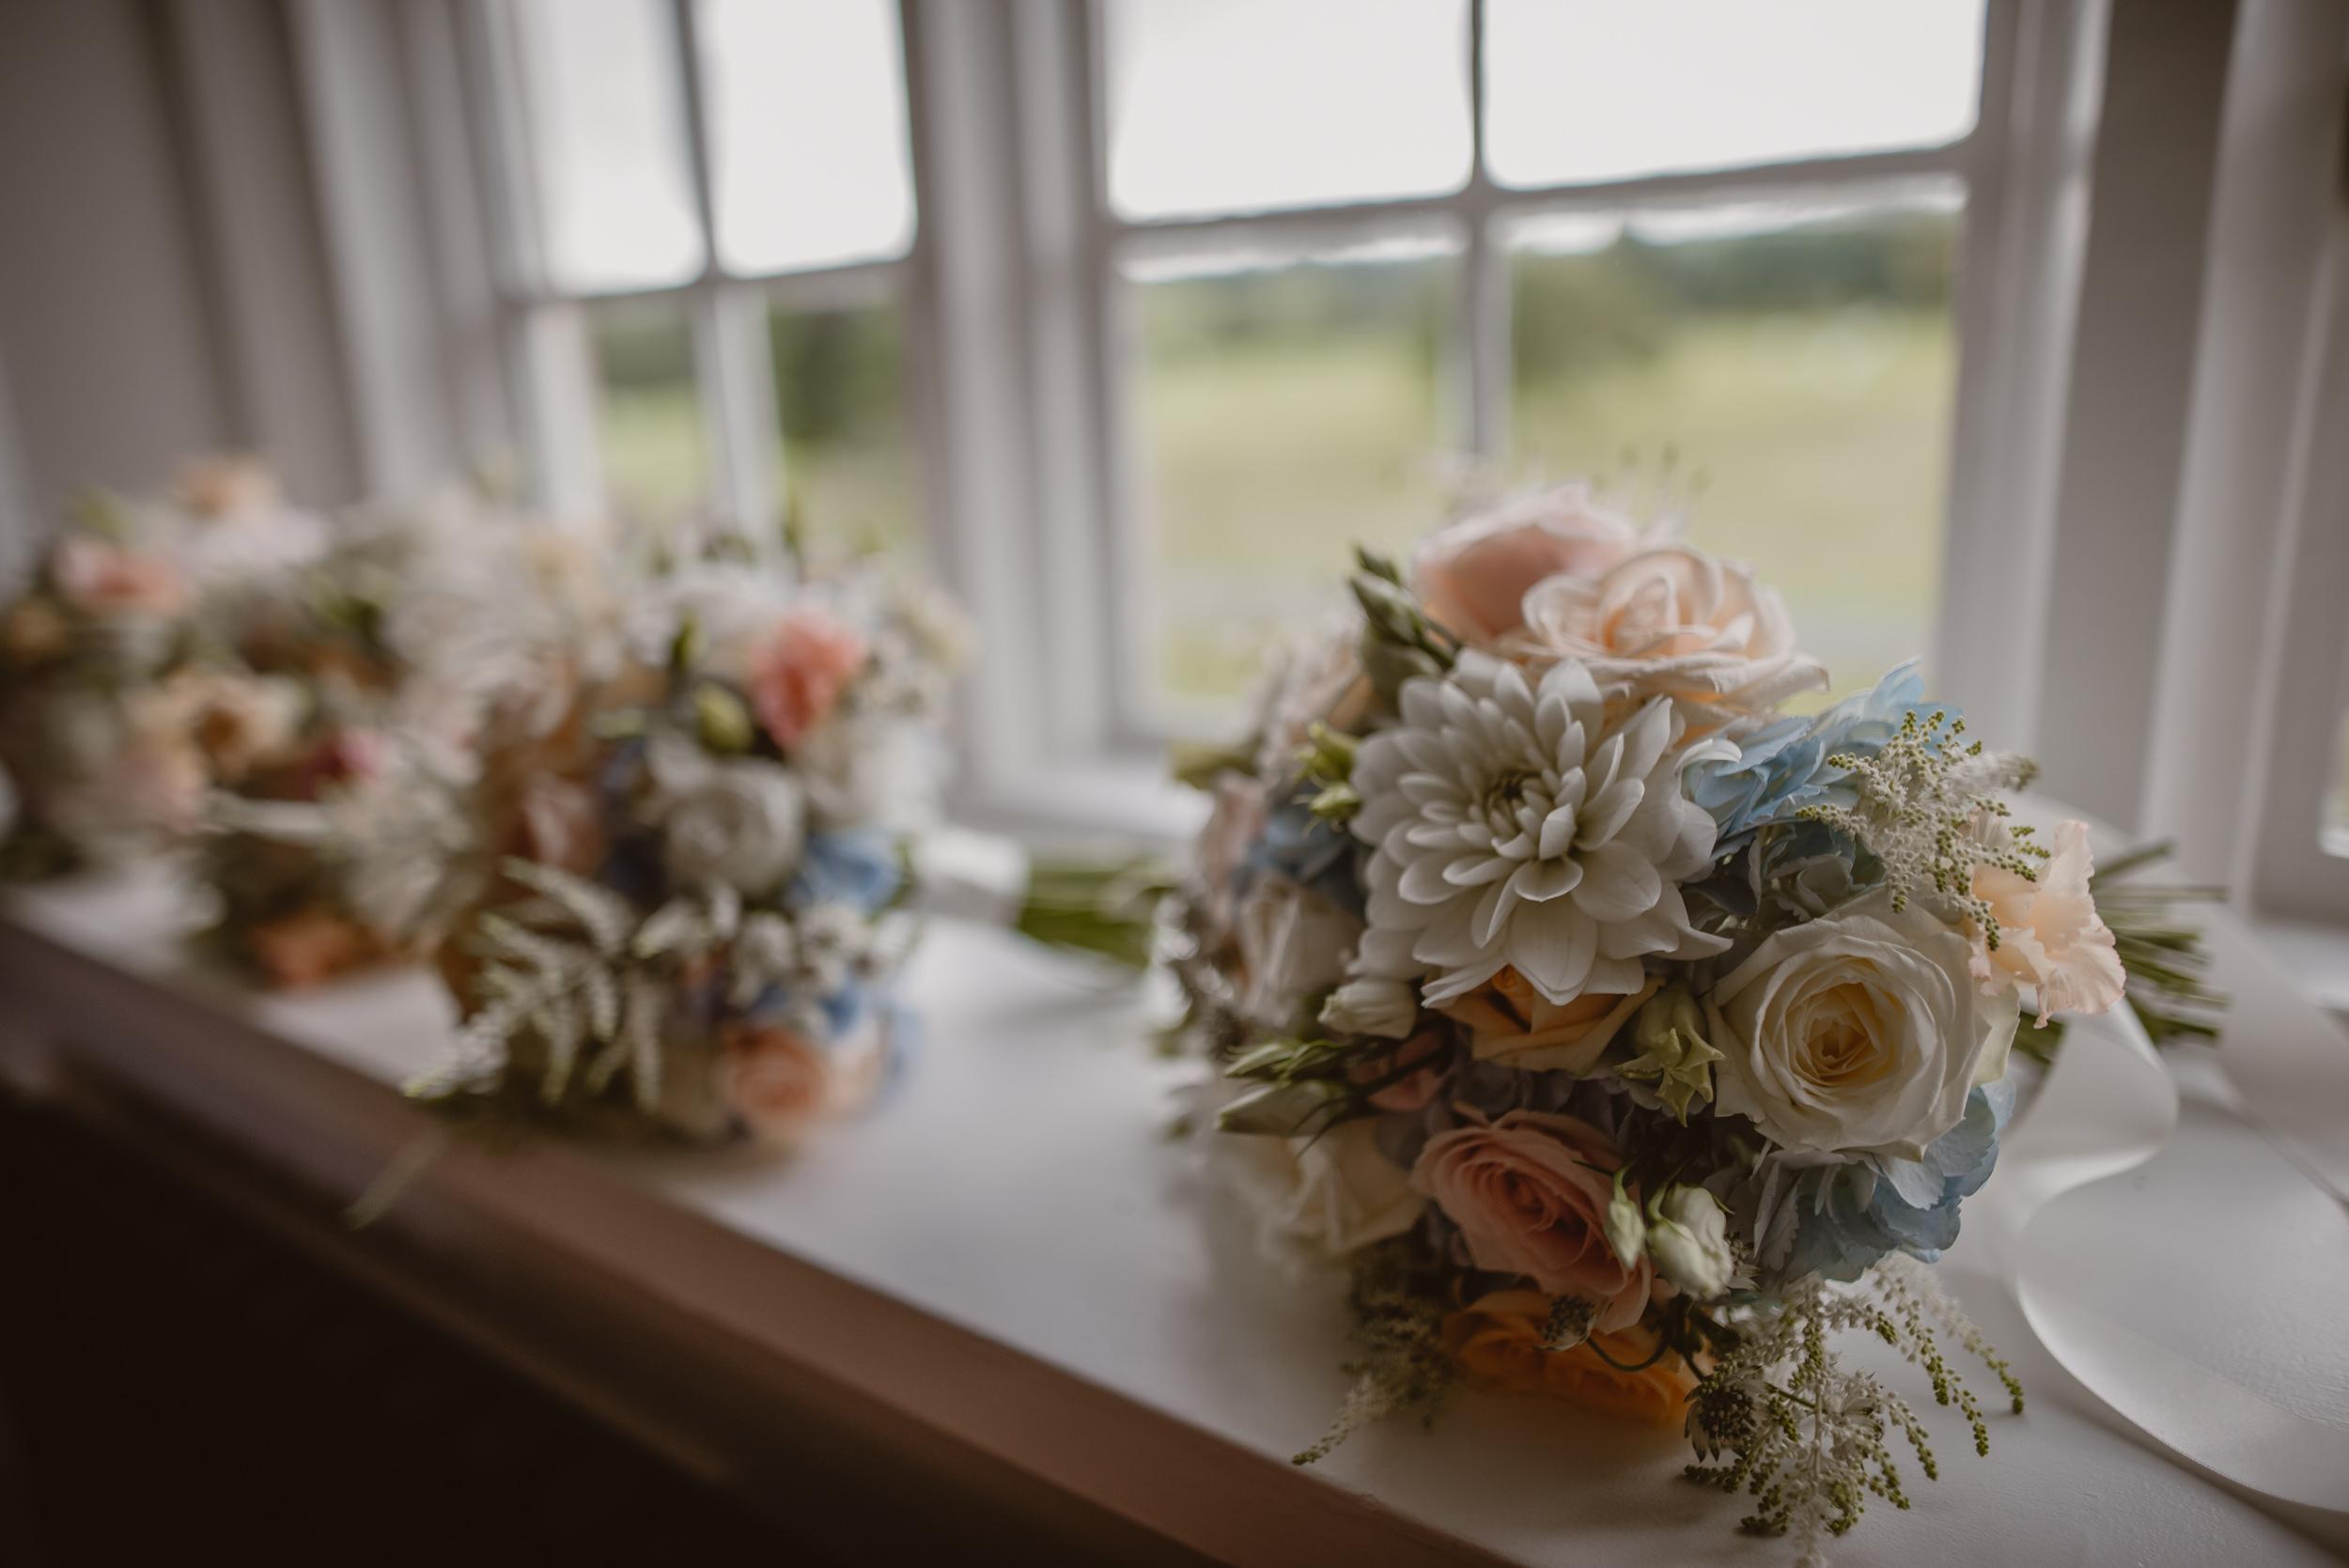 Rachel-and-James-Wedding-Horsley-Towers-State-Manu-Mendoza-Wedding-Photography-003.jpg